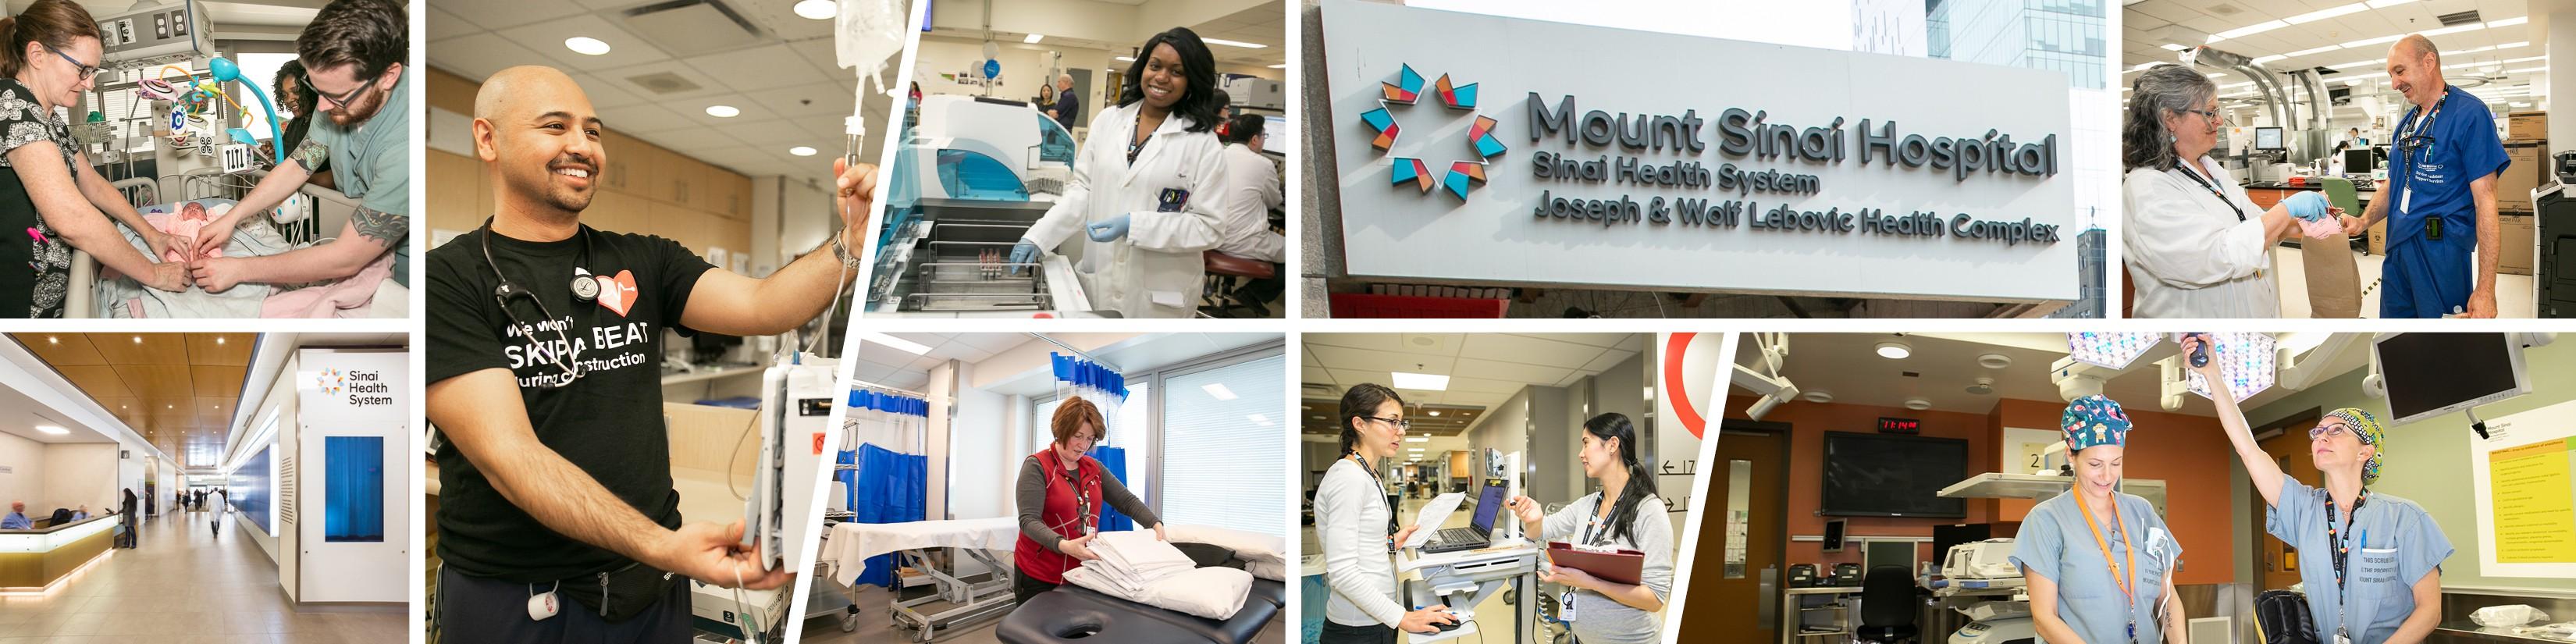 Mount Sinai Hospital (Toronto), Sinai Health System | LinkedIn